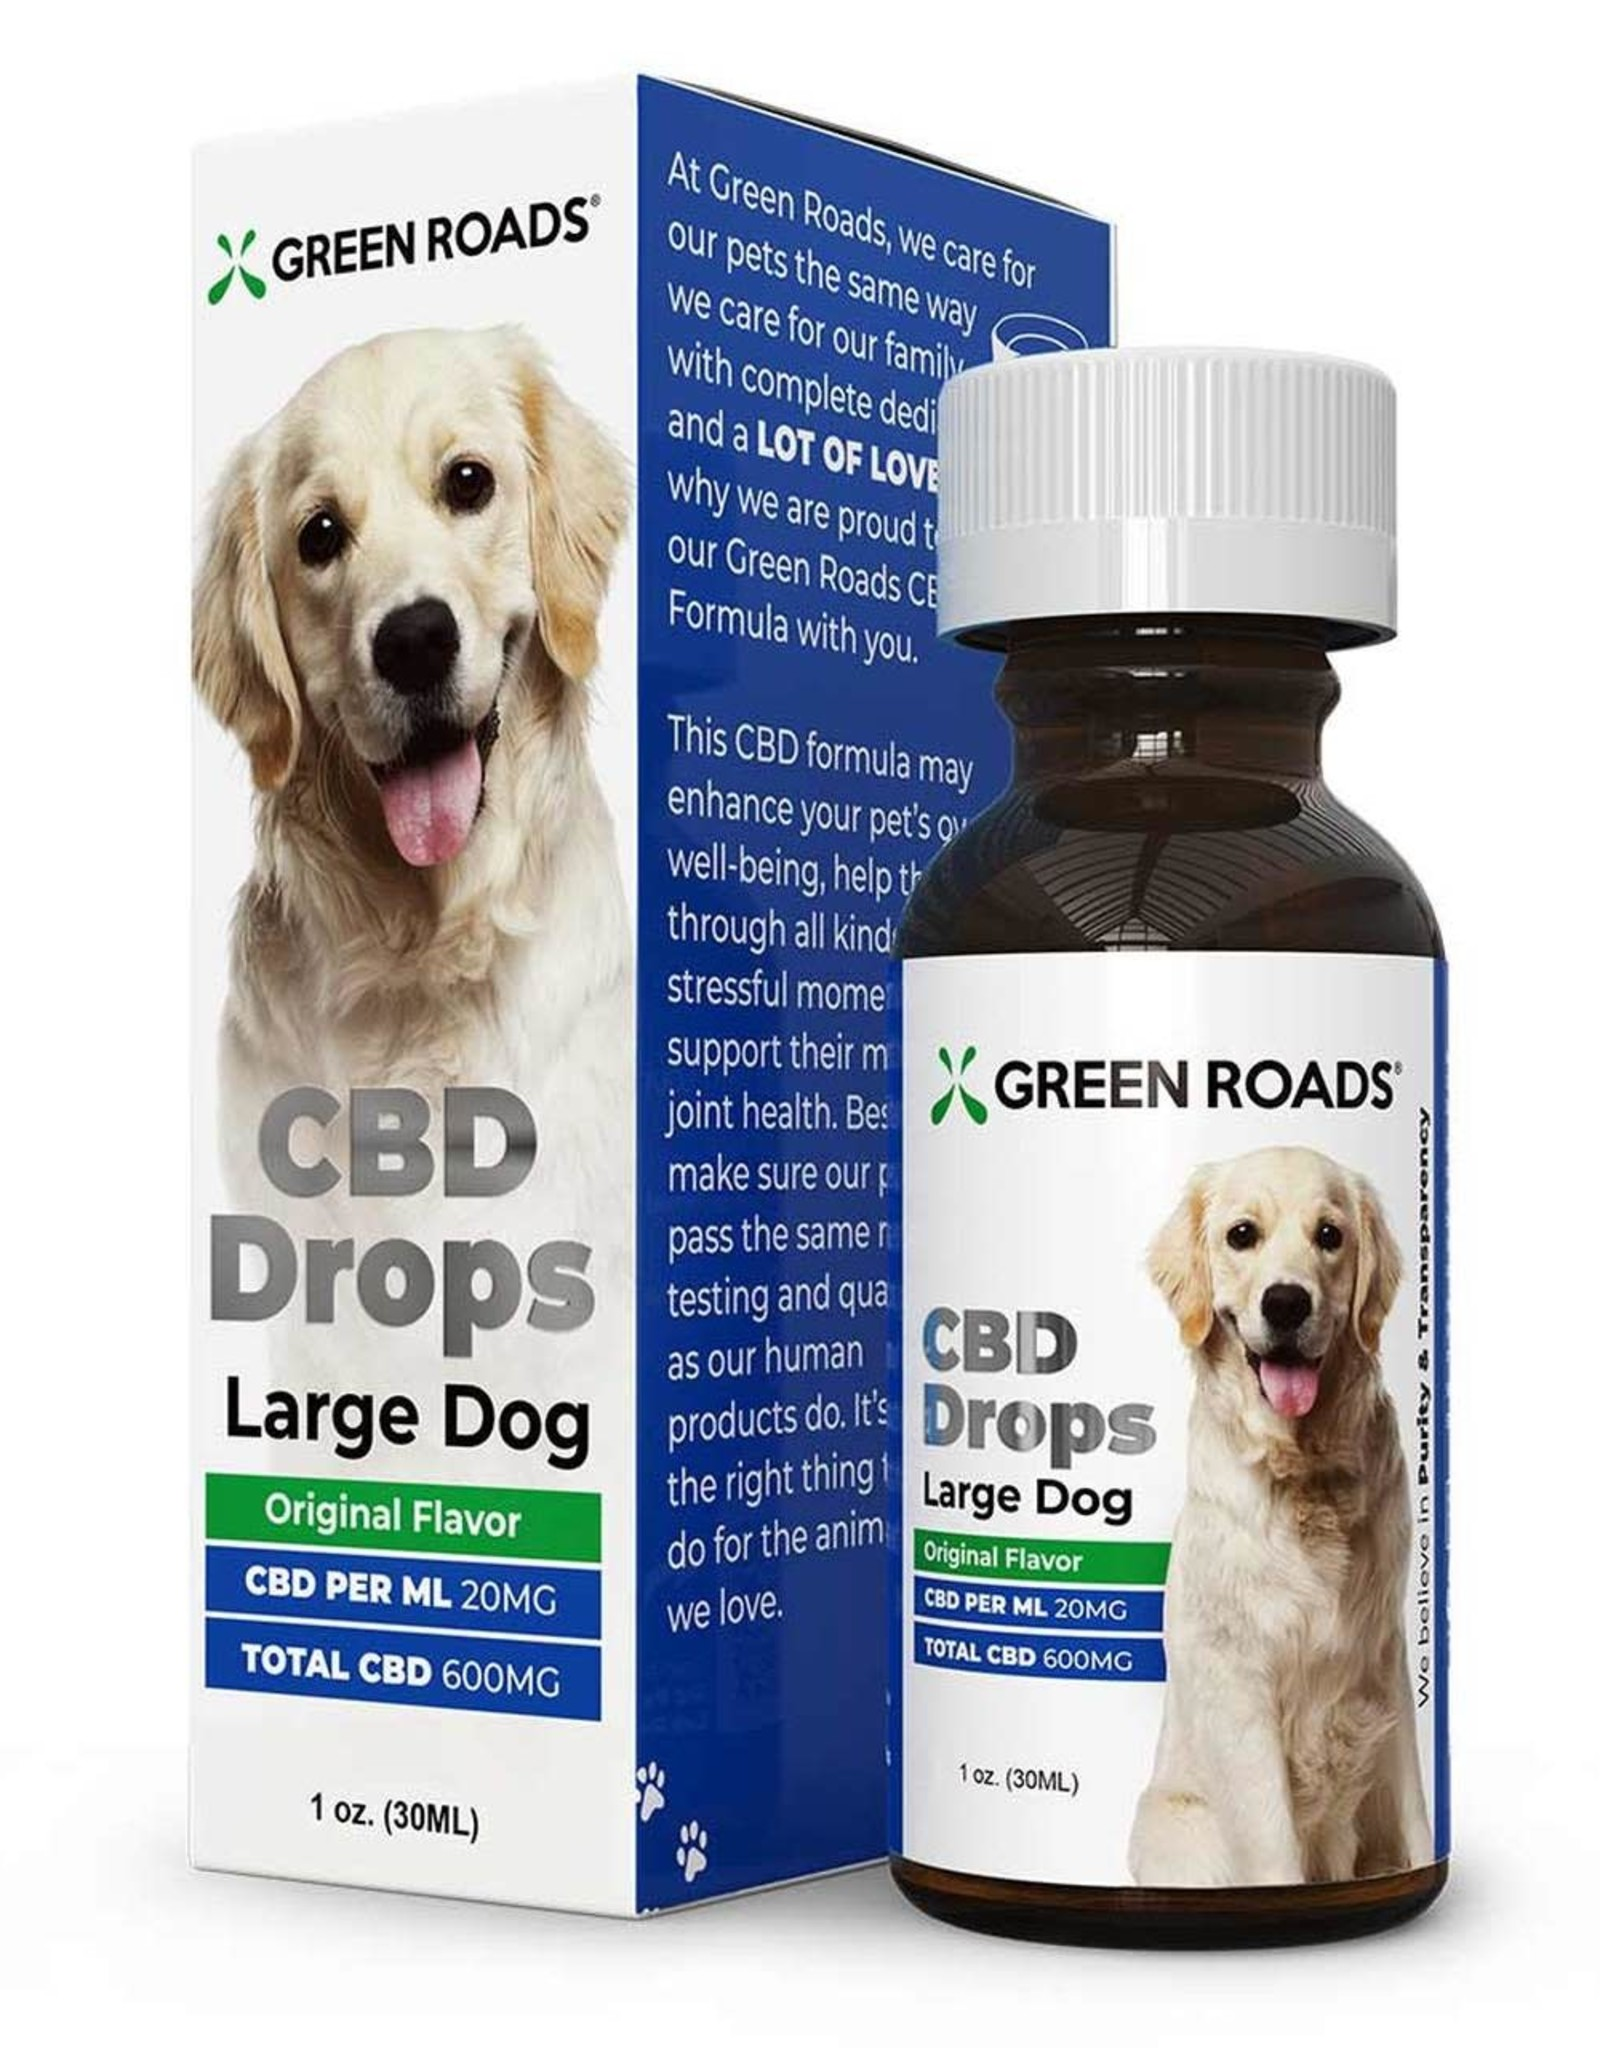 Green Roads CBD Drops for Dogs